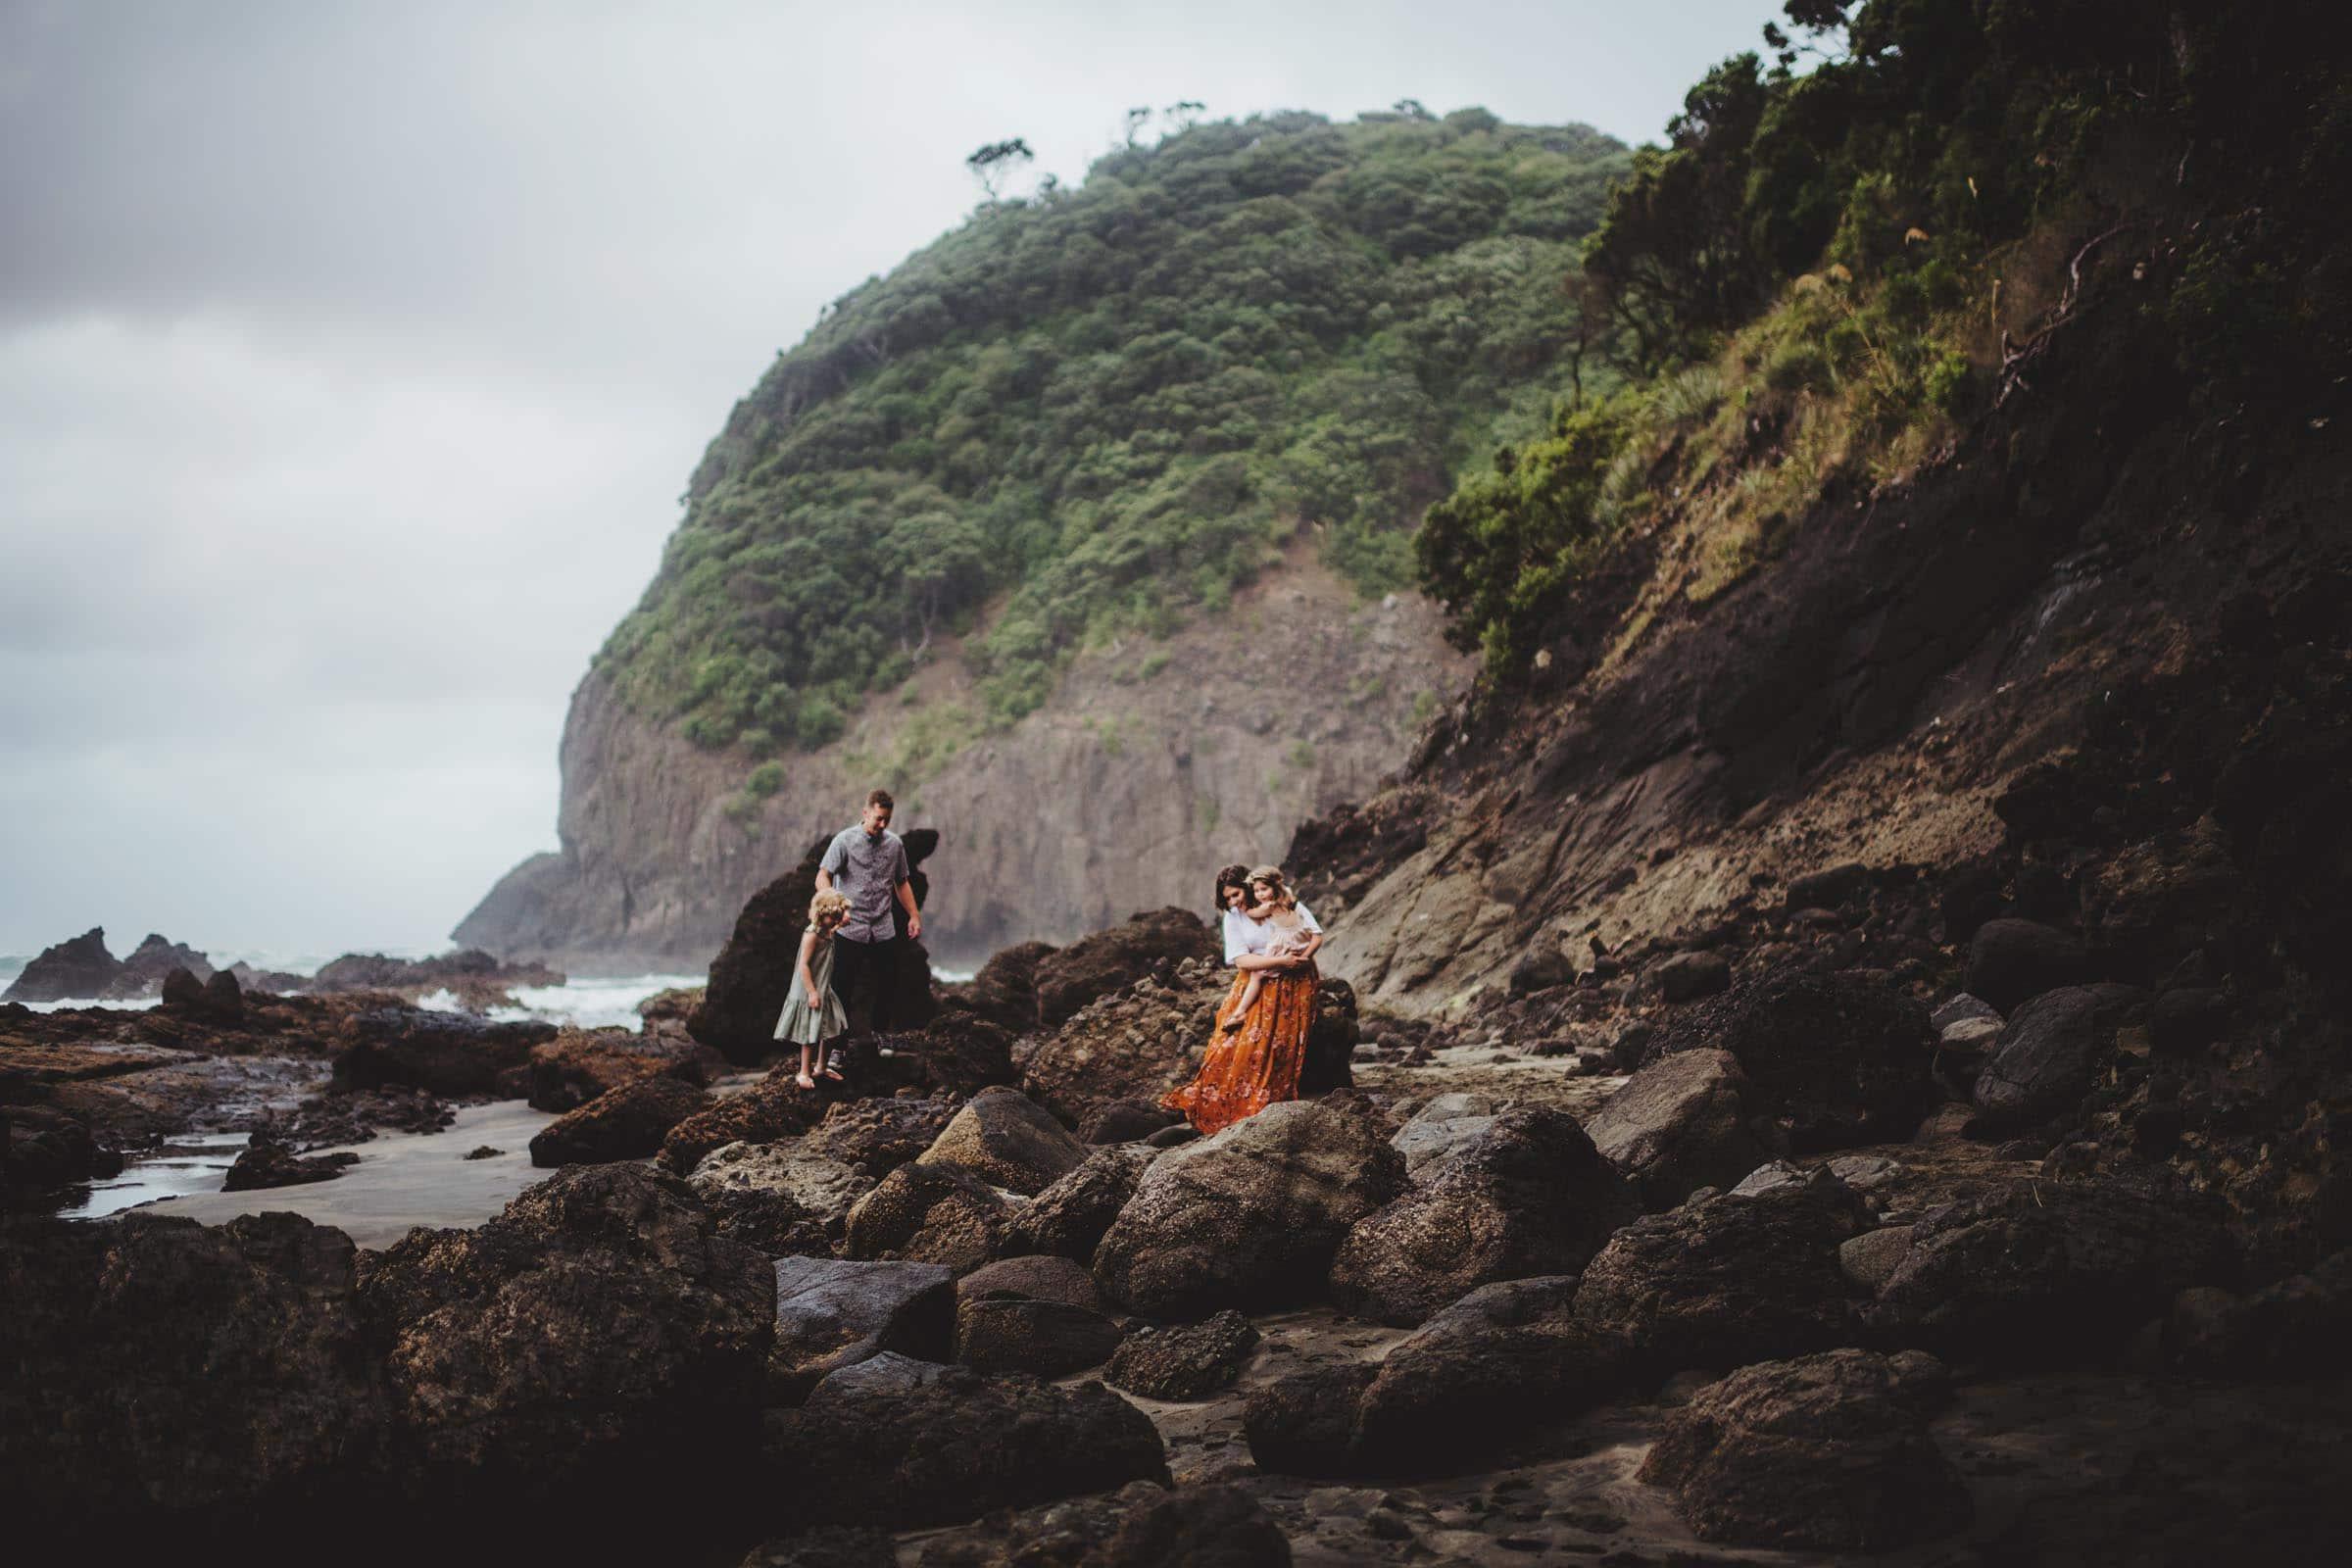 Family Far Away on Cliff Near Water